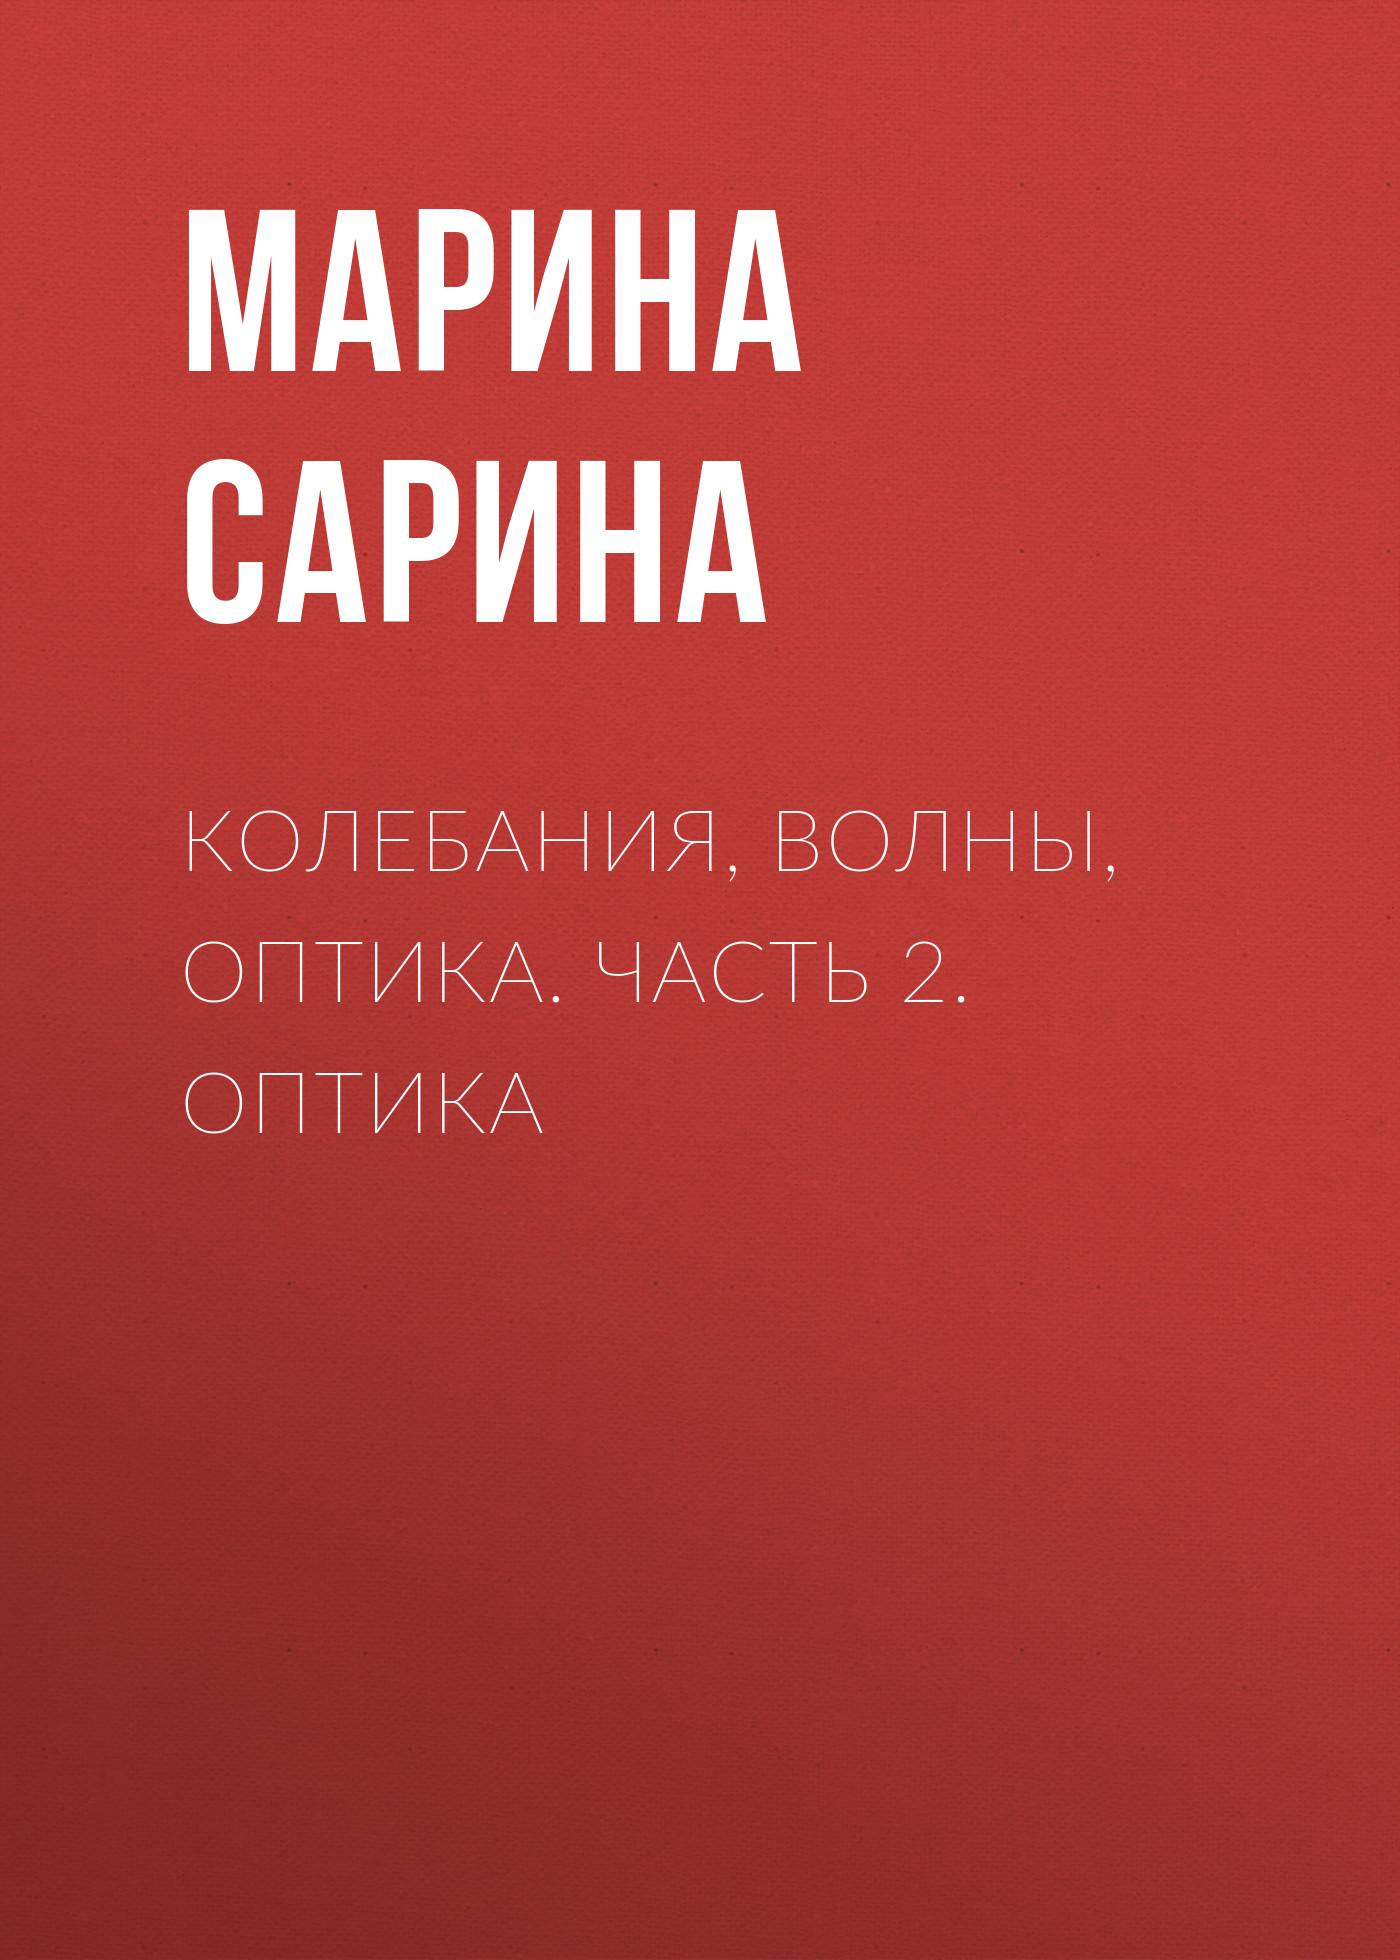 Марина Сарина Колебания, волны, оптика. Часть 2. Оптика оптика